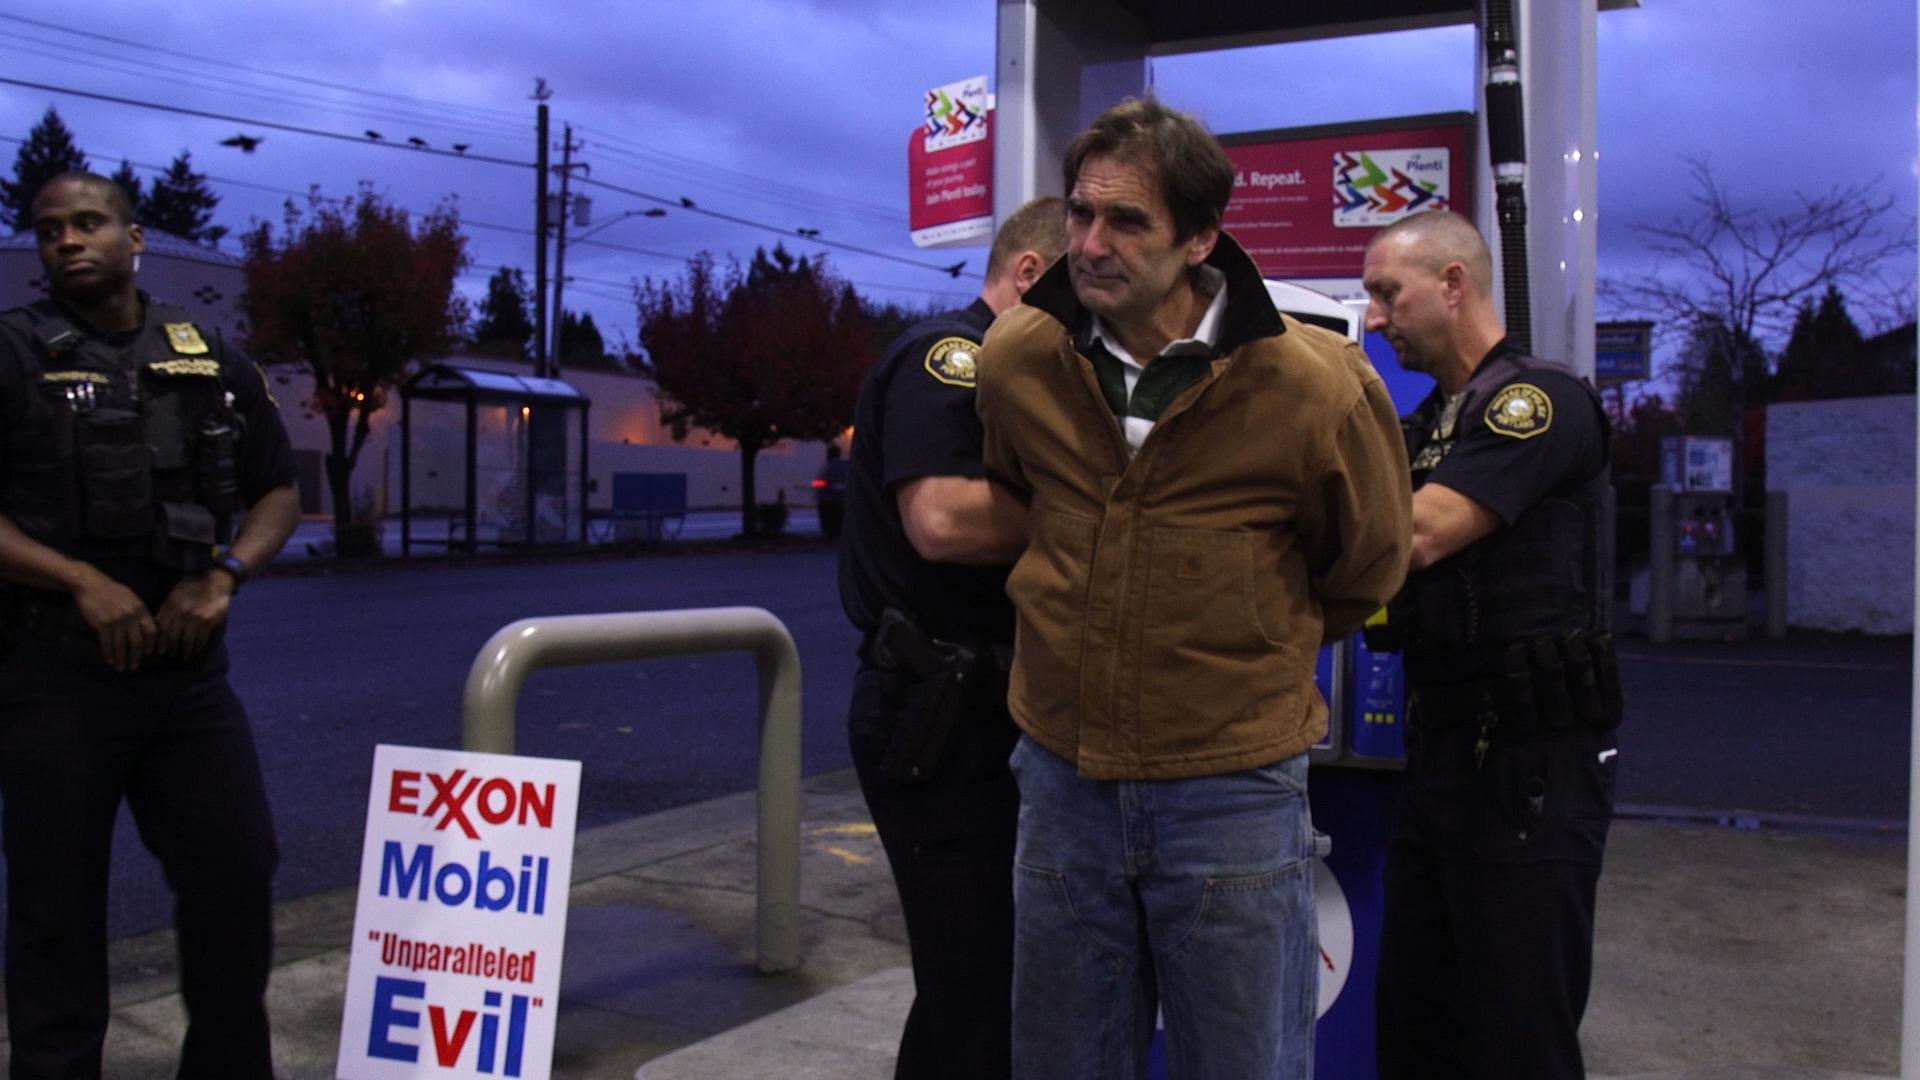 Ken Ward is arrested protesting Exxon Mobil.